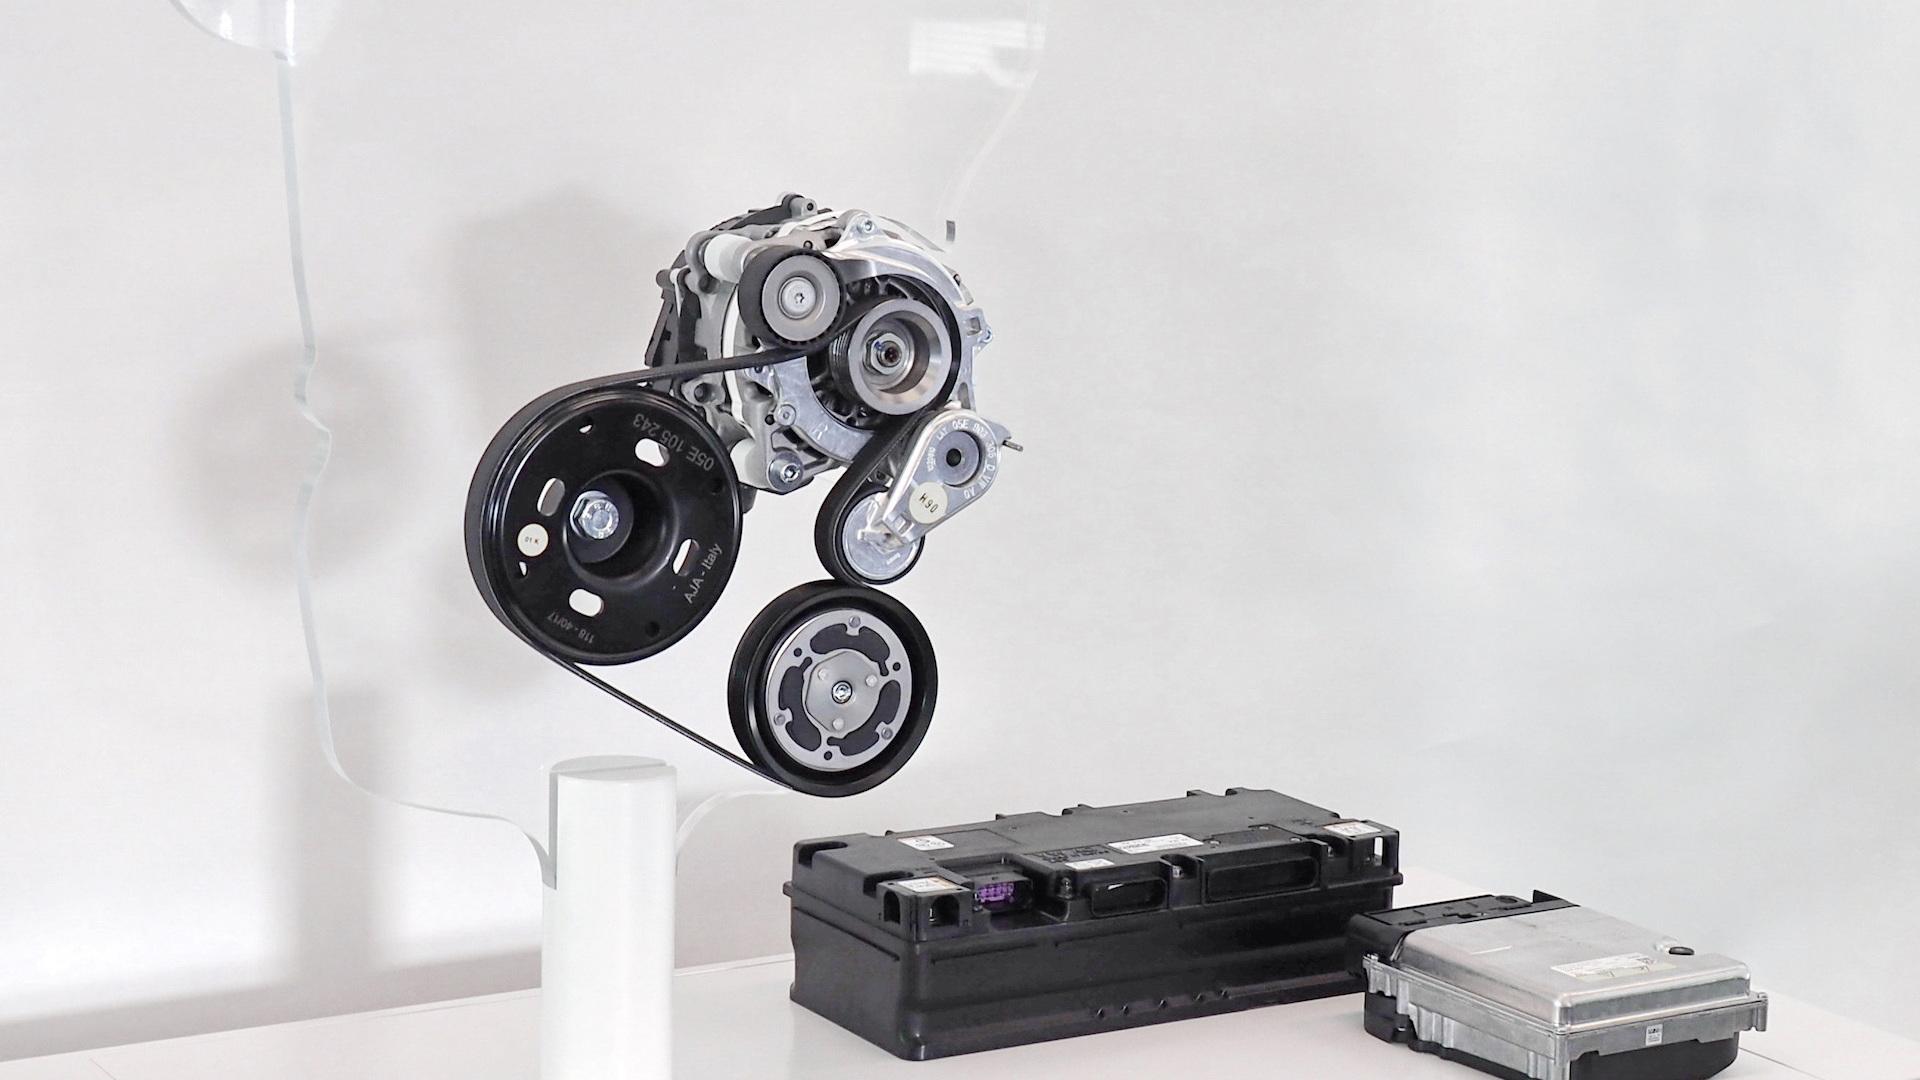 Volkswagen 48-volt mild-hybrid system